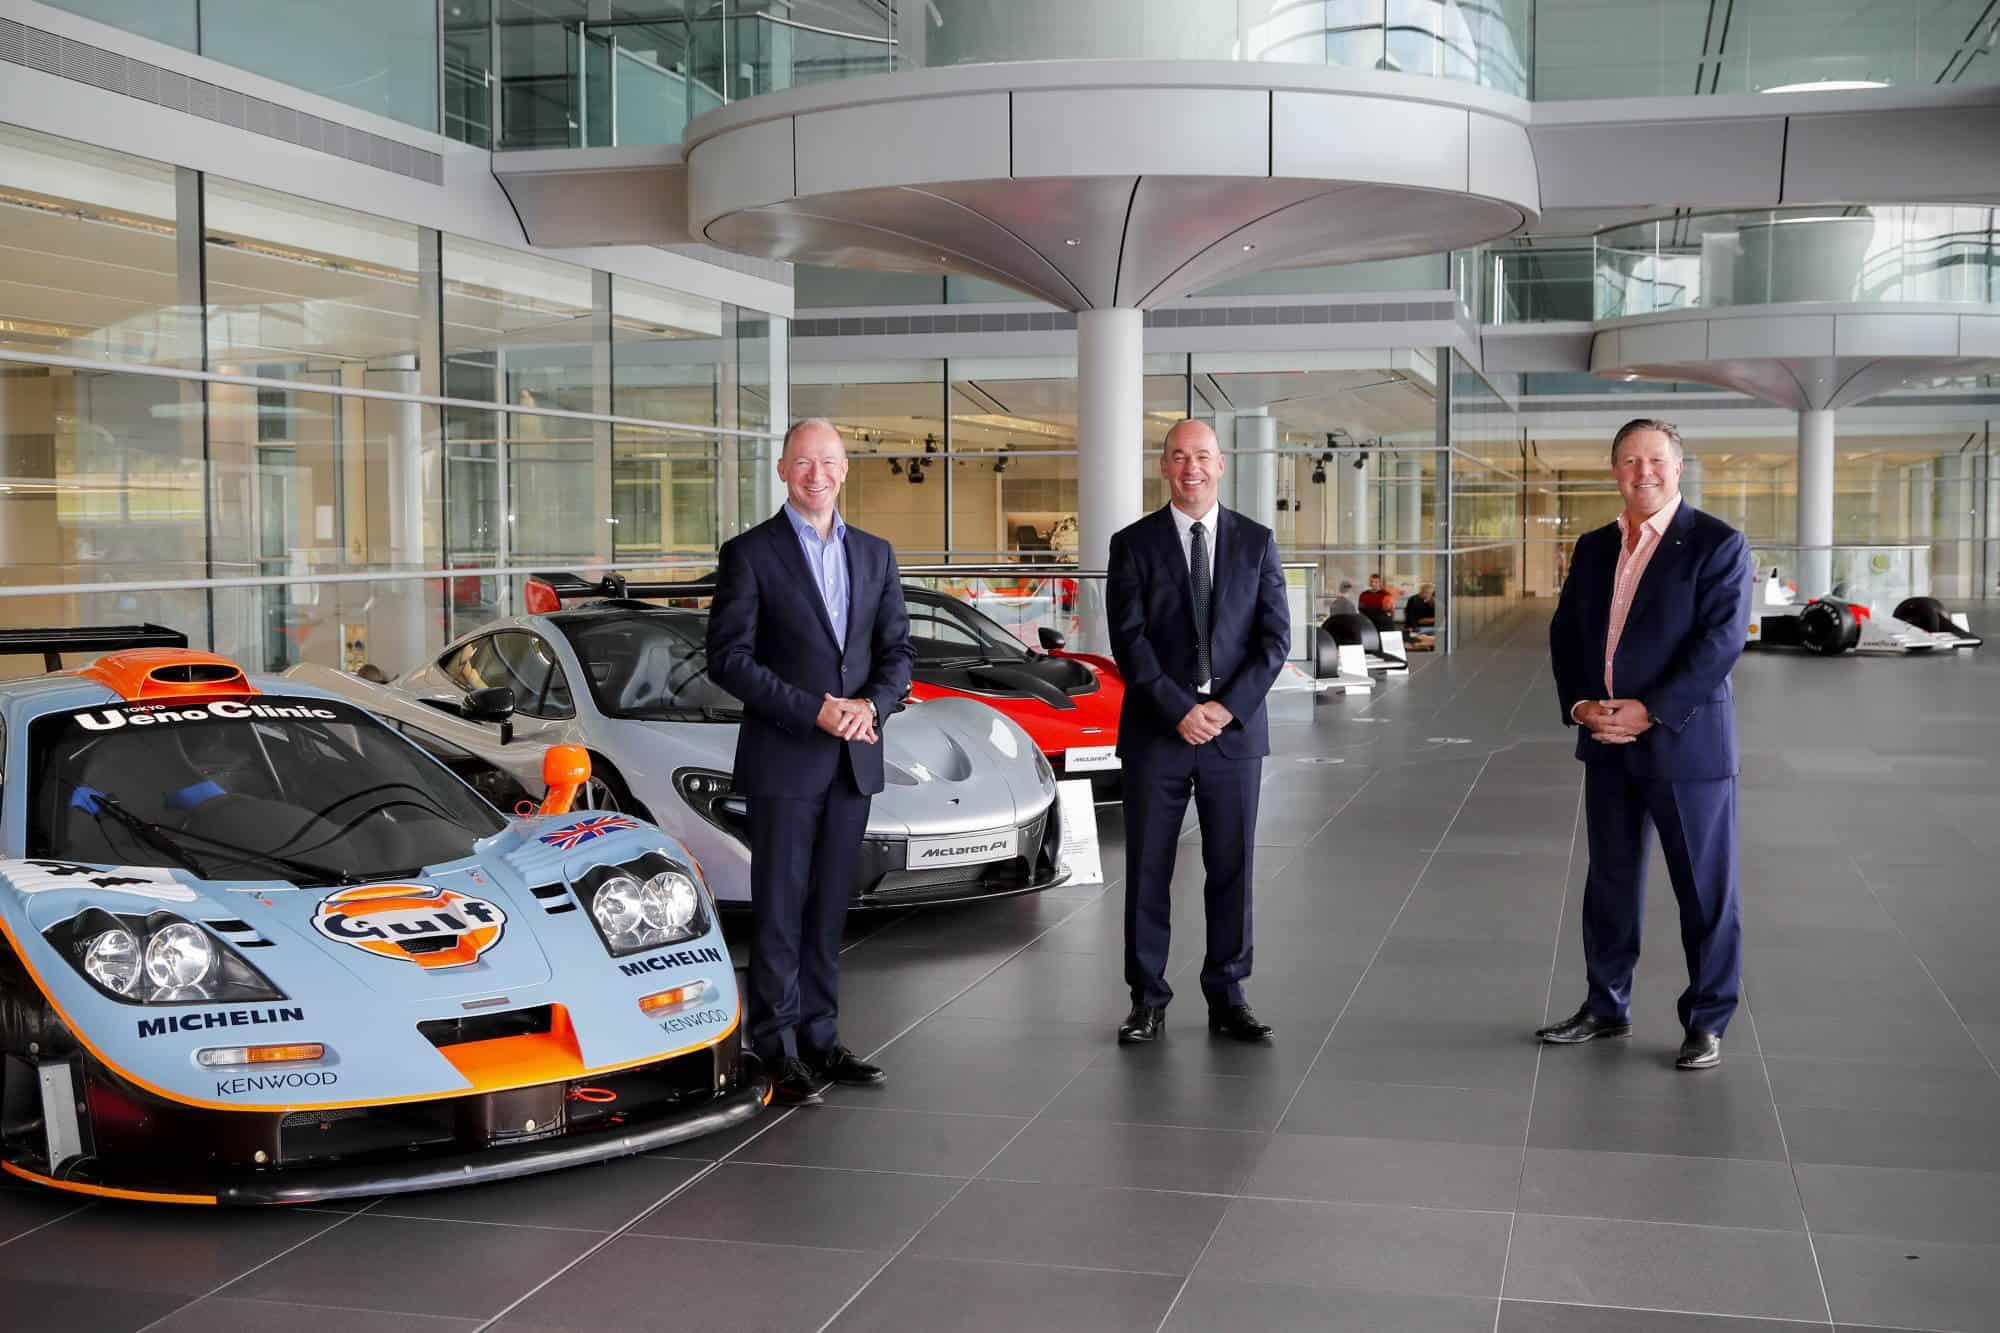 From left to right Mike Flewitt McLaren Automotive CEO Mike Jones Gulf Oil International Ltd CEO Zak Brown McLaren Racing CEO Photo McLaren